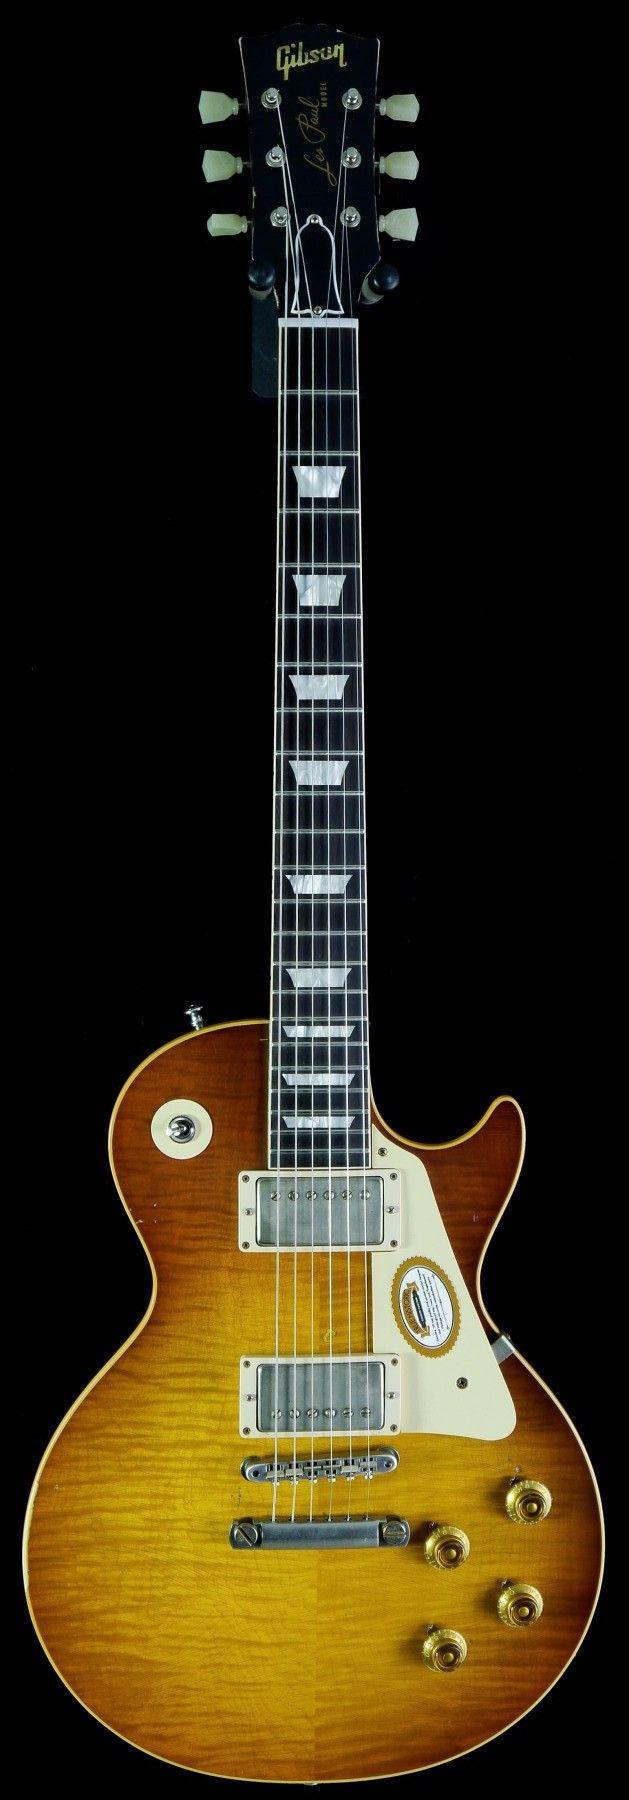 Gibson Custom Collector's Choice 43 - Mick Ralphs 1958 Les Paul Standard